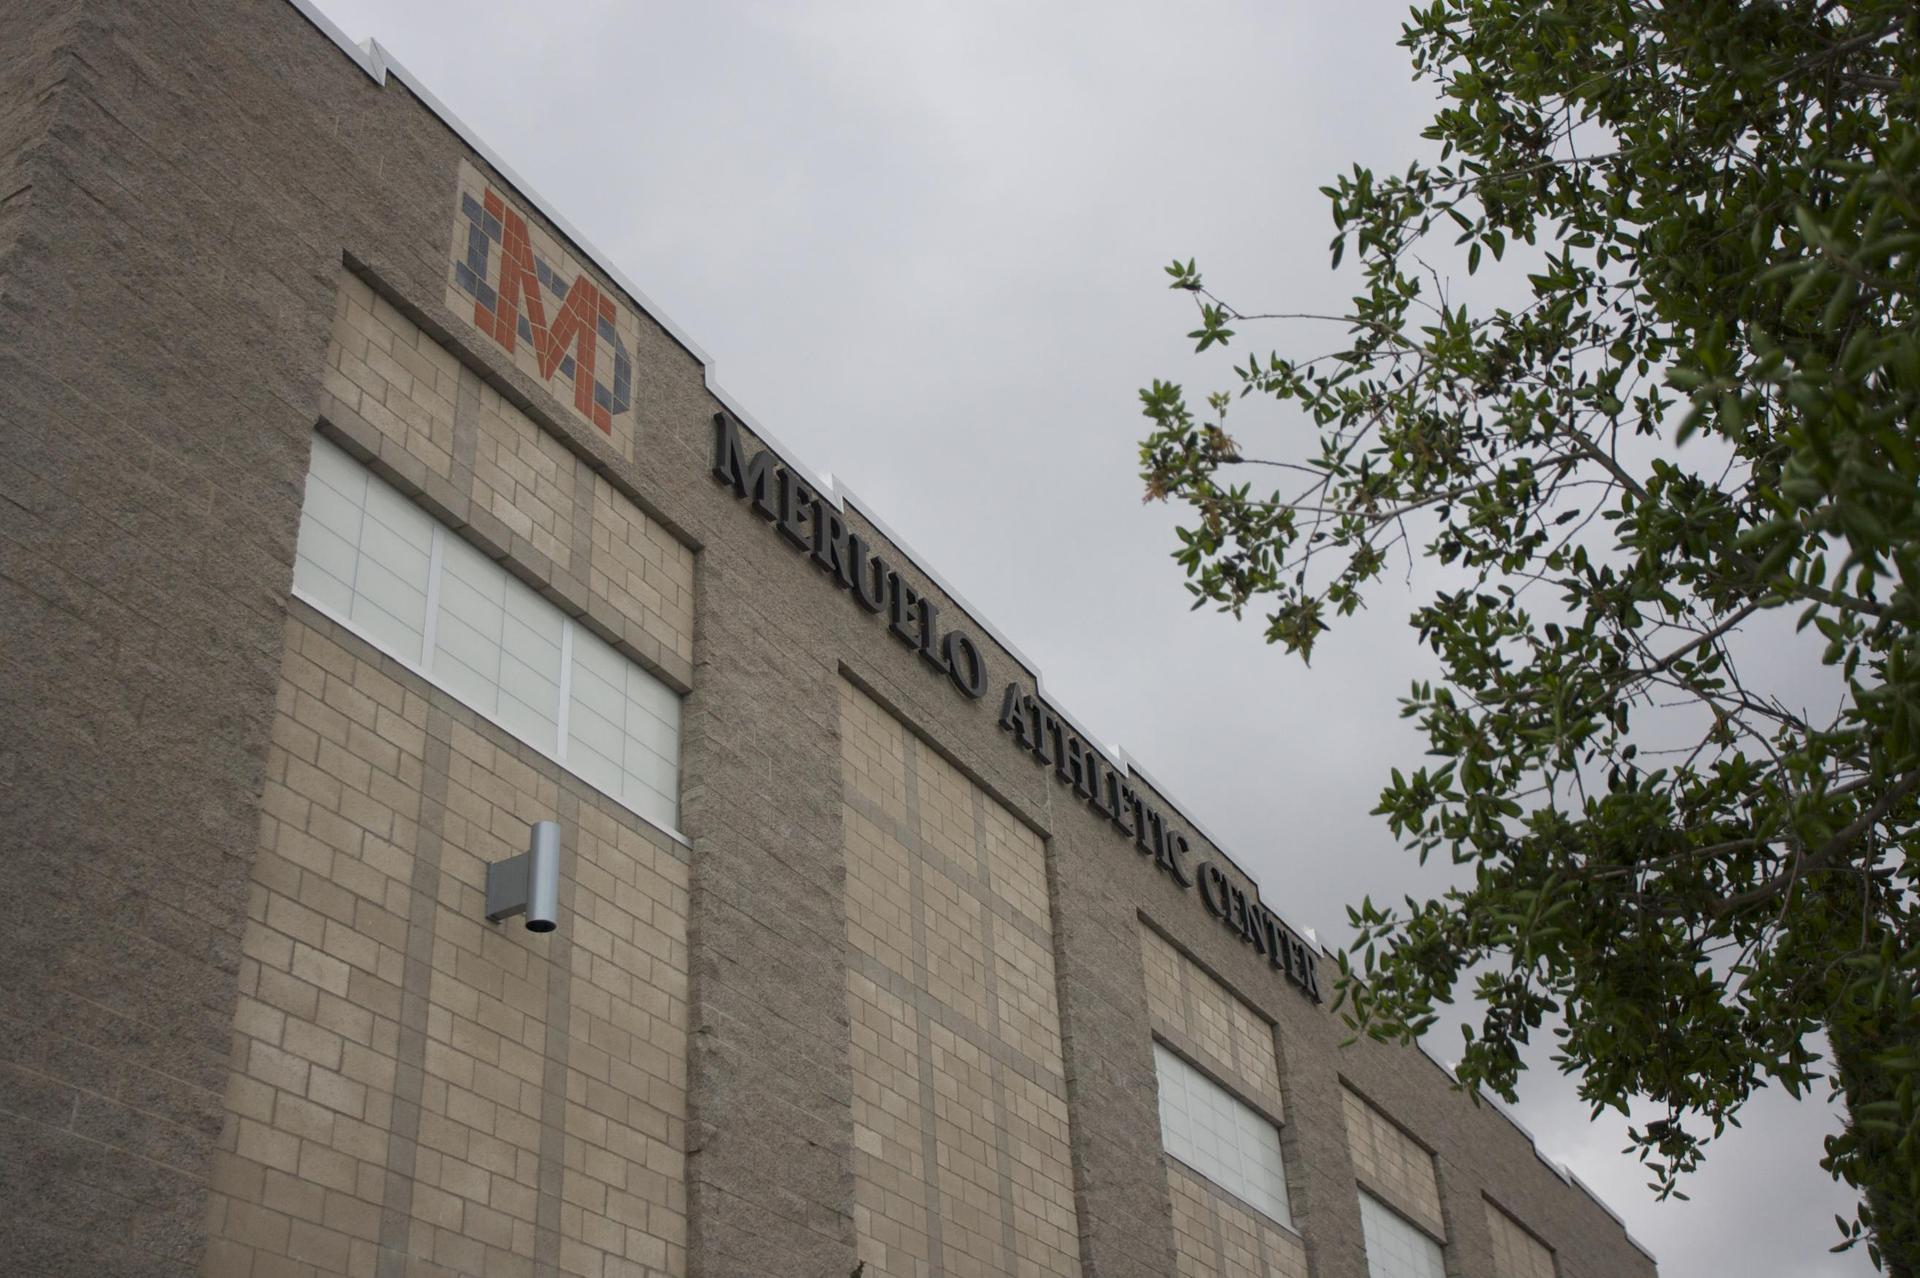 meruelo athletic center